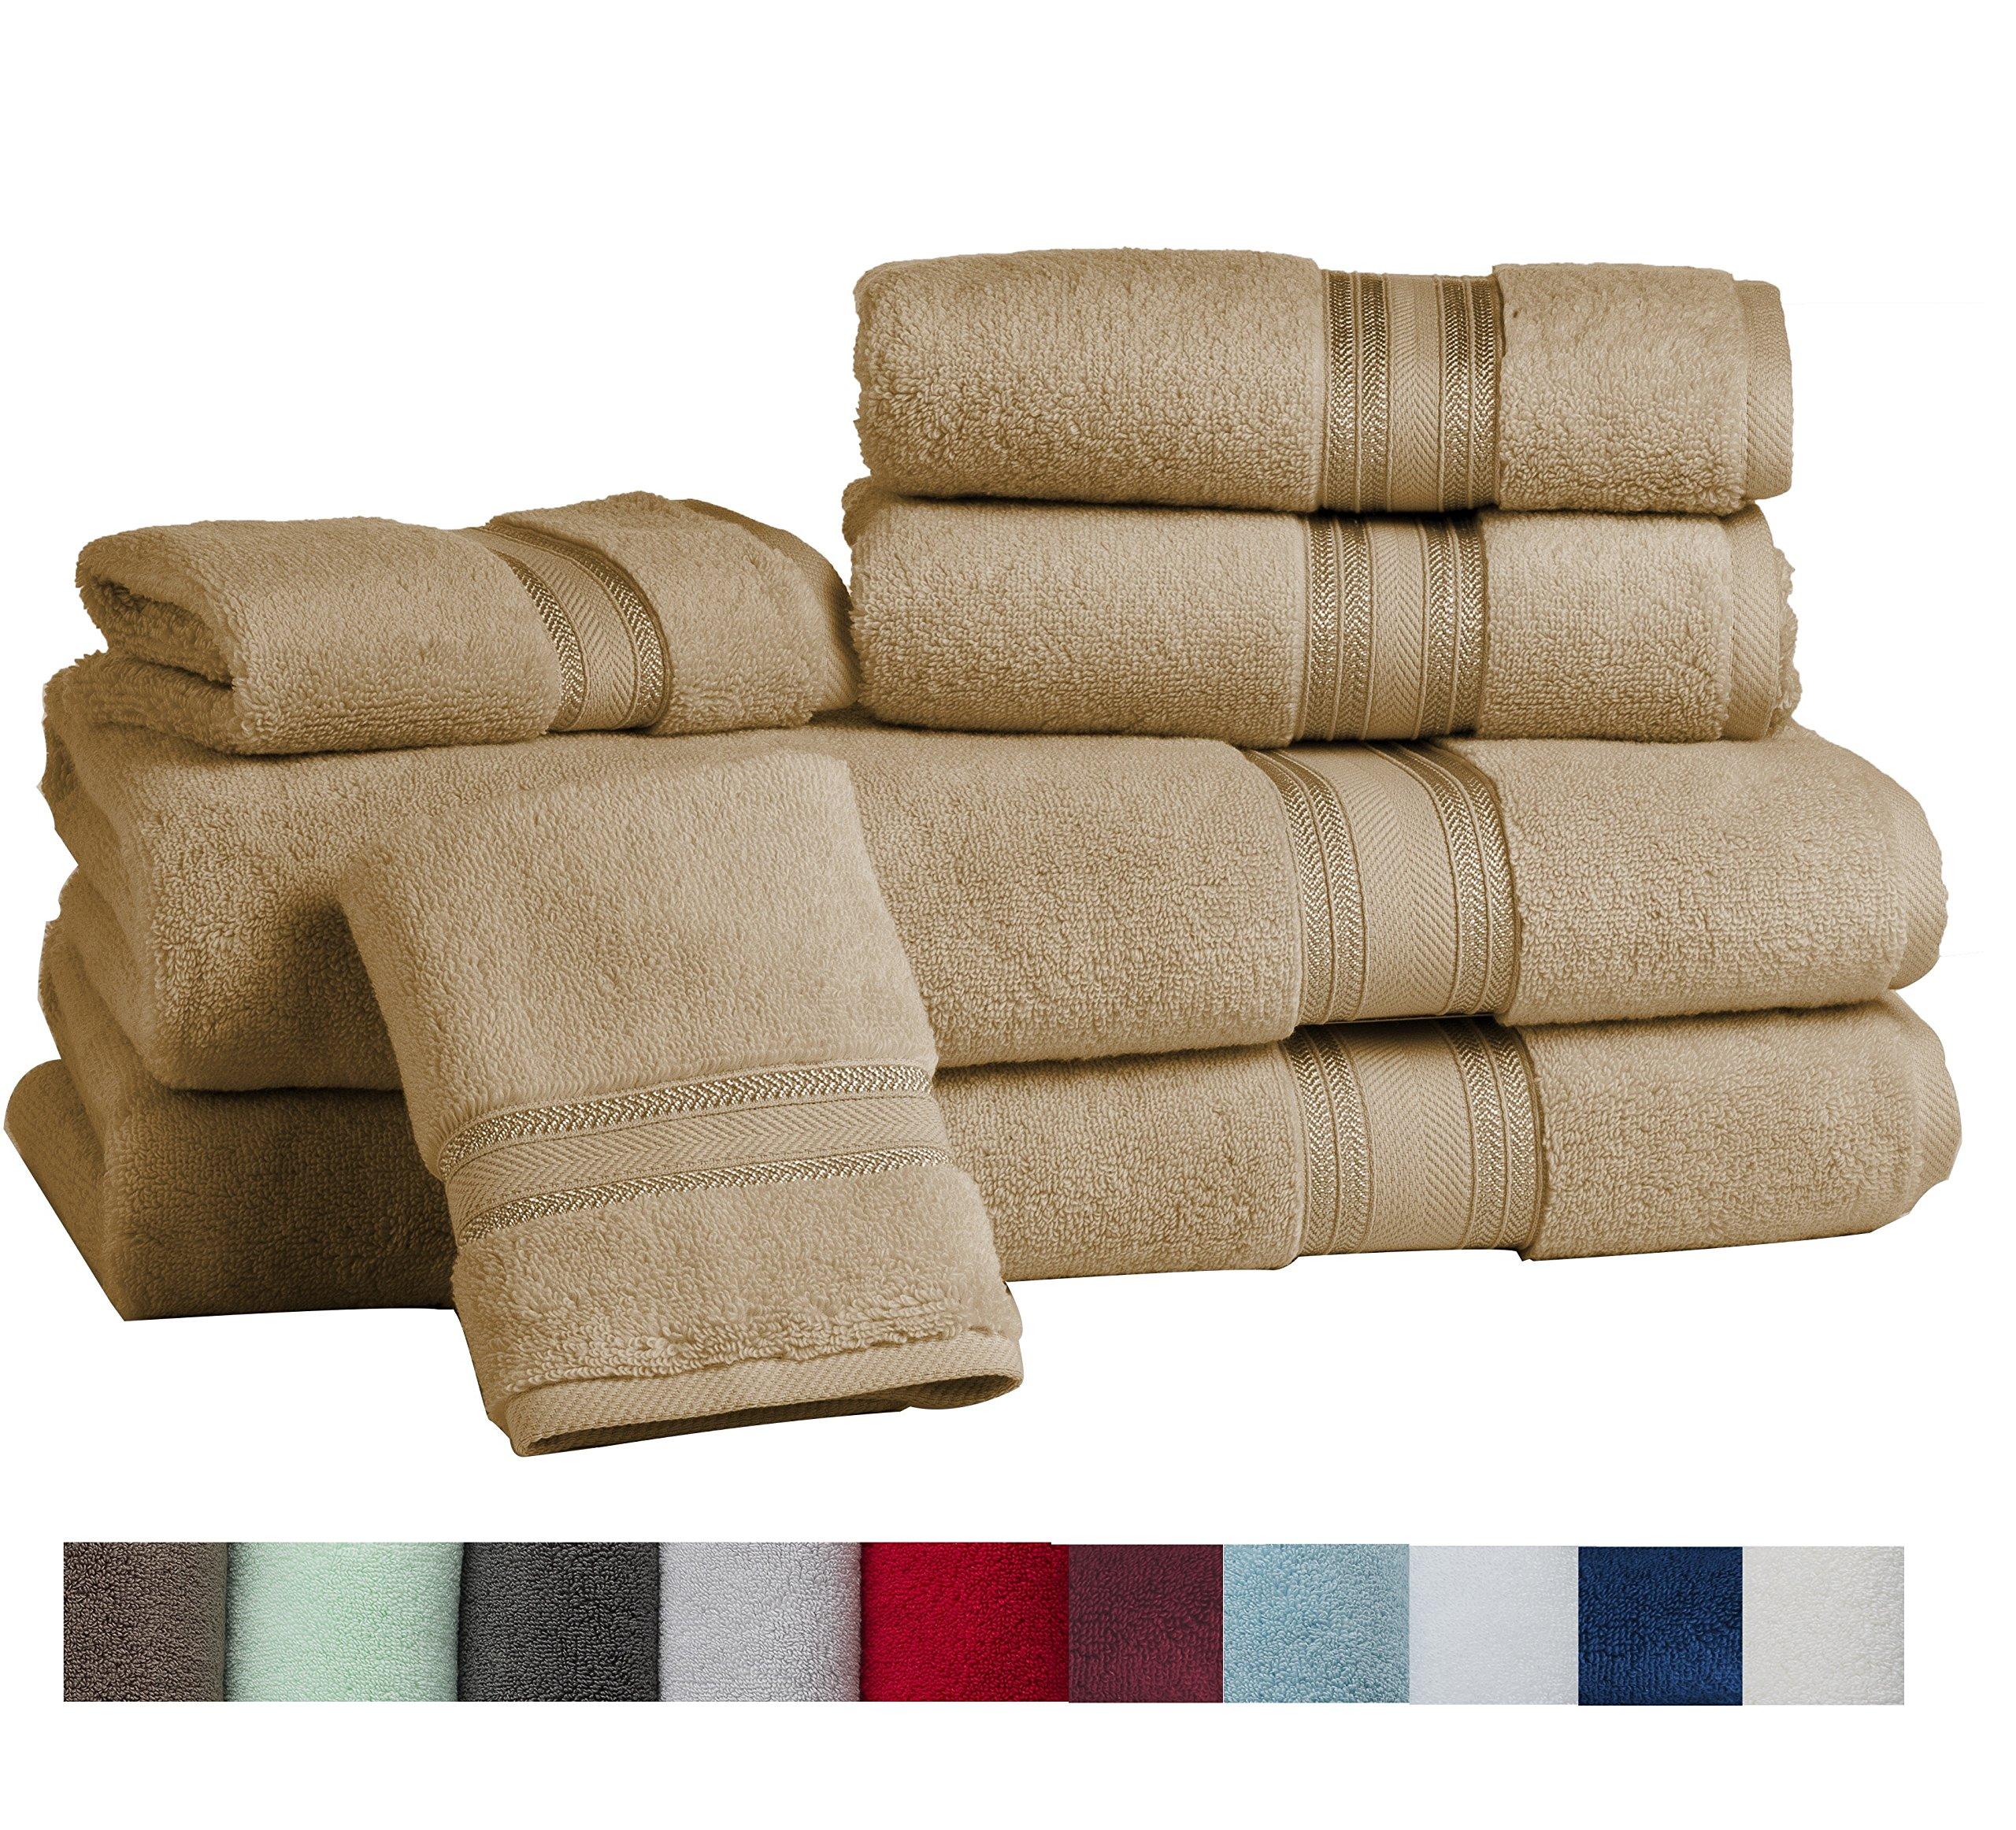 Casa Lino Quick Dry Super Zero Twist 6 Piece Bath Towel Set 7 Star Hotel Luxury Collection, 2 Bath Towel 28x54'', 2 Hand Towel- 16x28'', Face Towel- 13x13'' (taupe) by Lezeth Collection